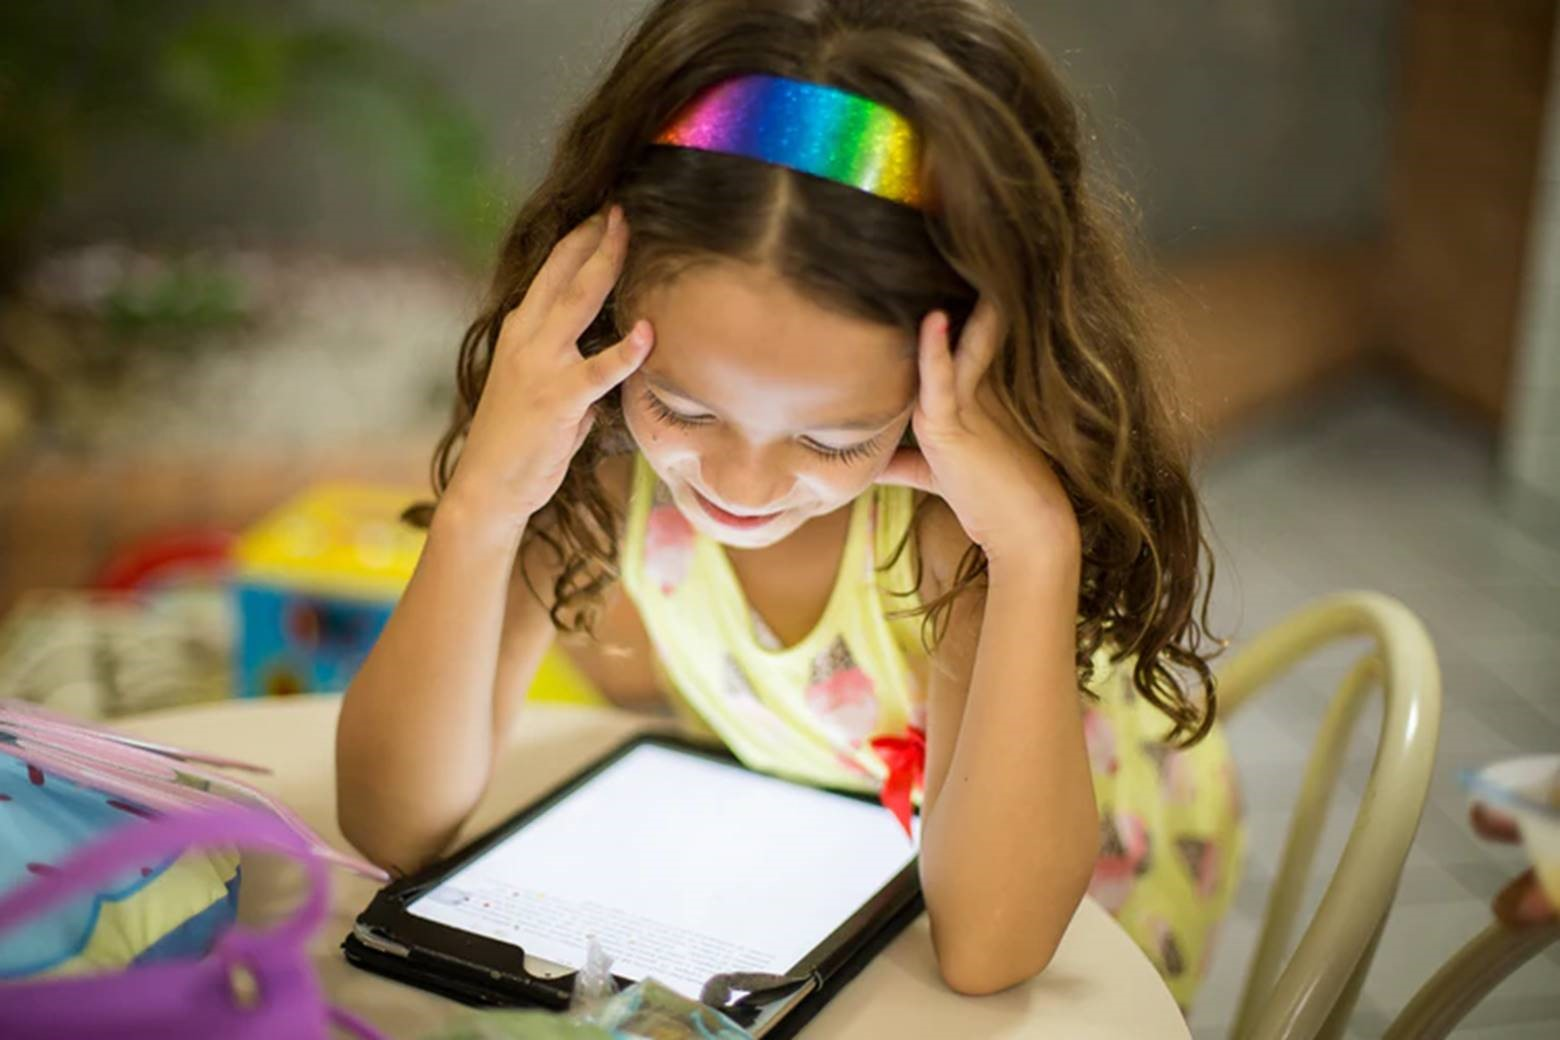 Child reading an iPad